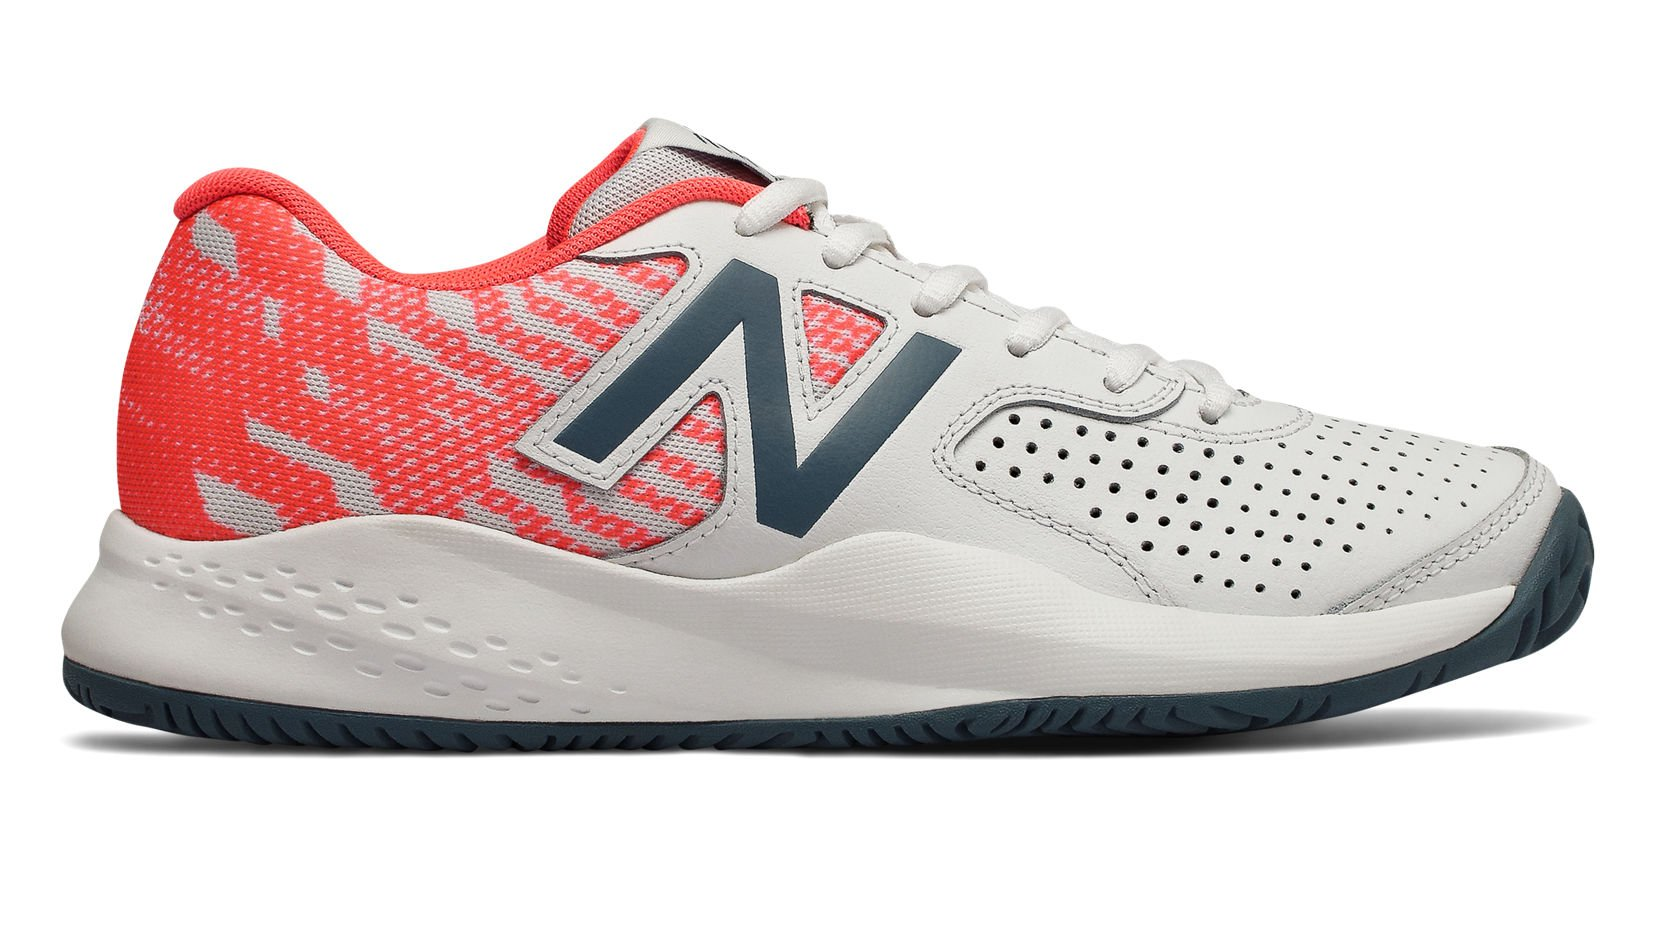 New Balance Women's 696v3 Hard Court Tennis Shoe, White, 7.5 D US